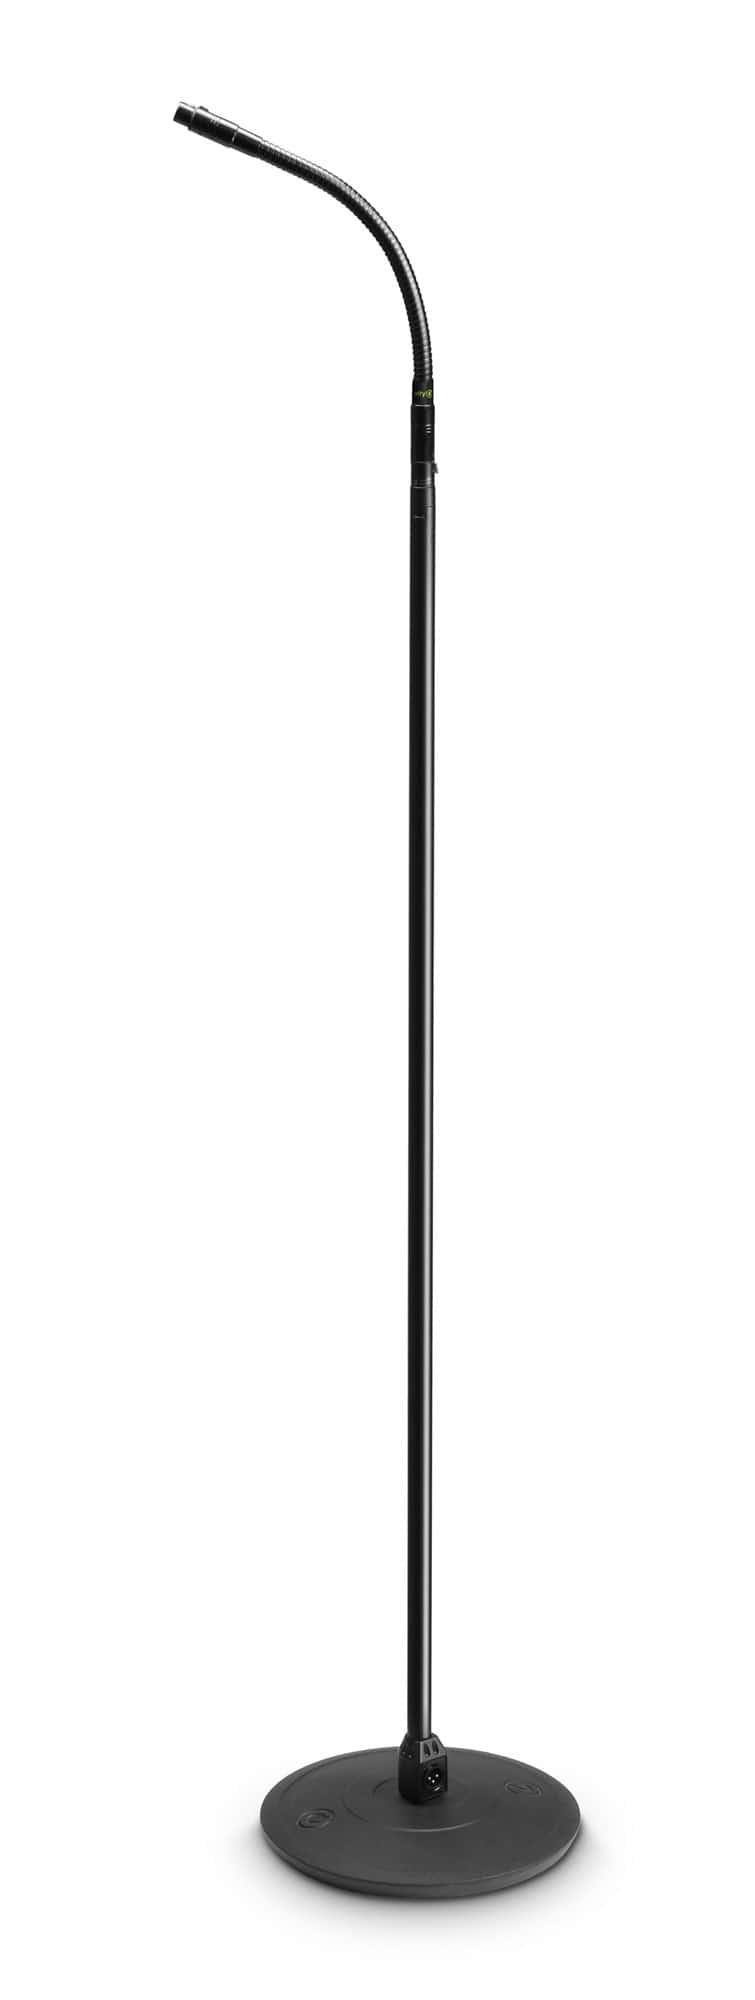 Studiozubehoer - Gravity MS 23 XLR B Mikrofonständer - Onlineshop Musikhaus Kirstein